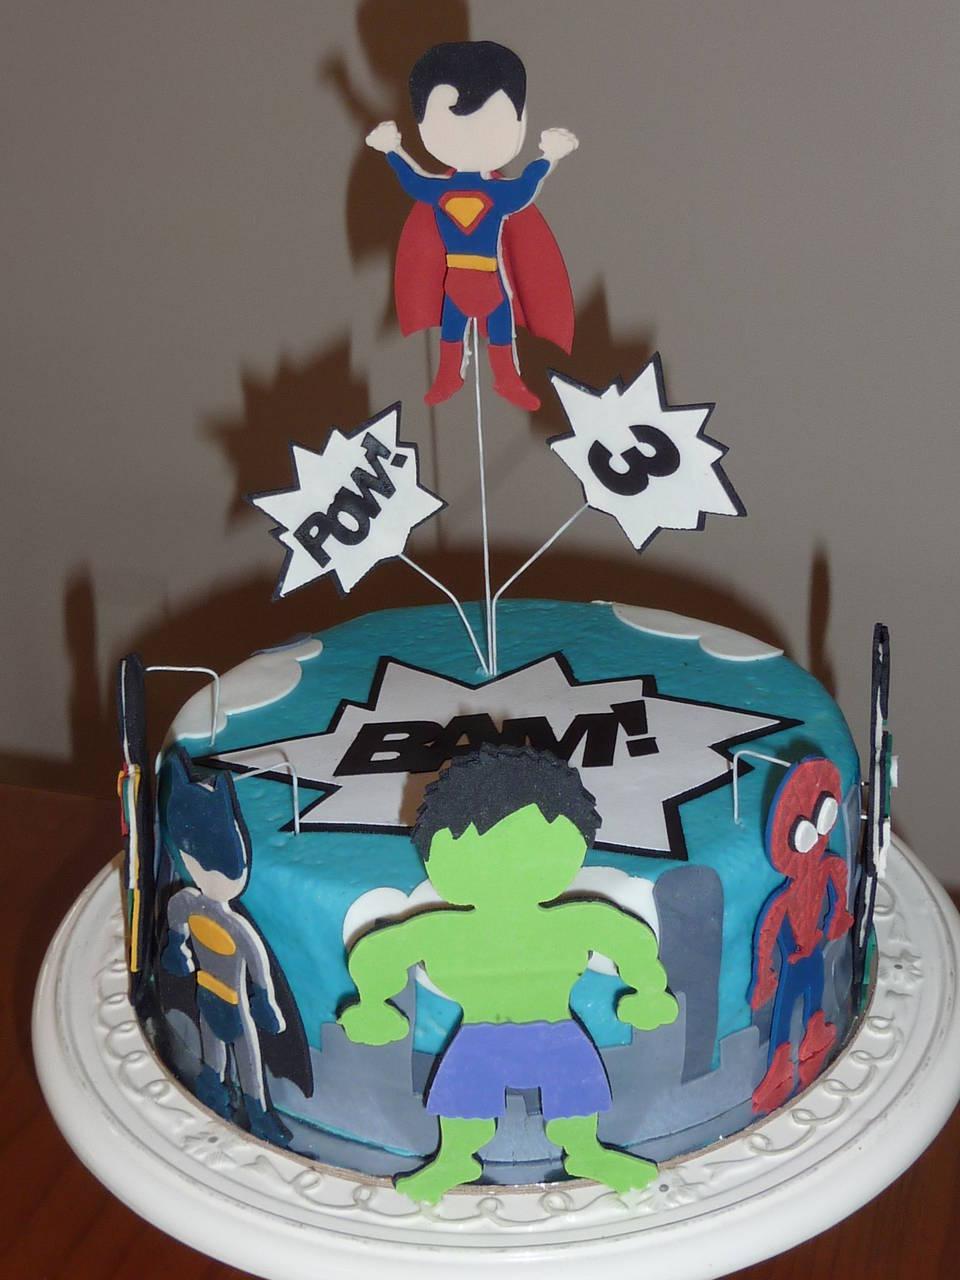 Ryder's Super Hero 3rd Birthday Cake